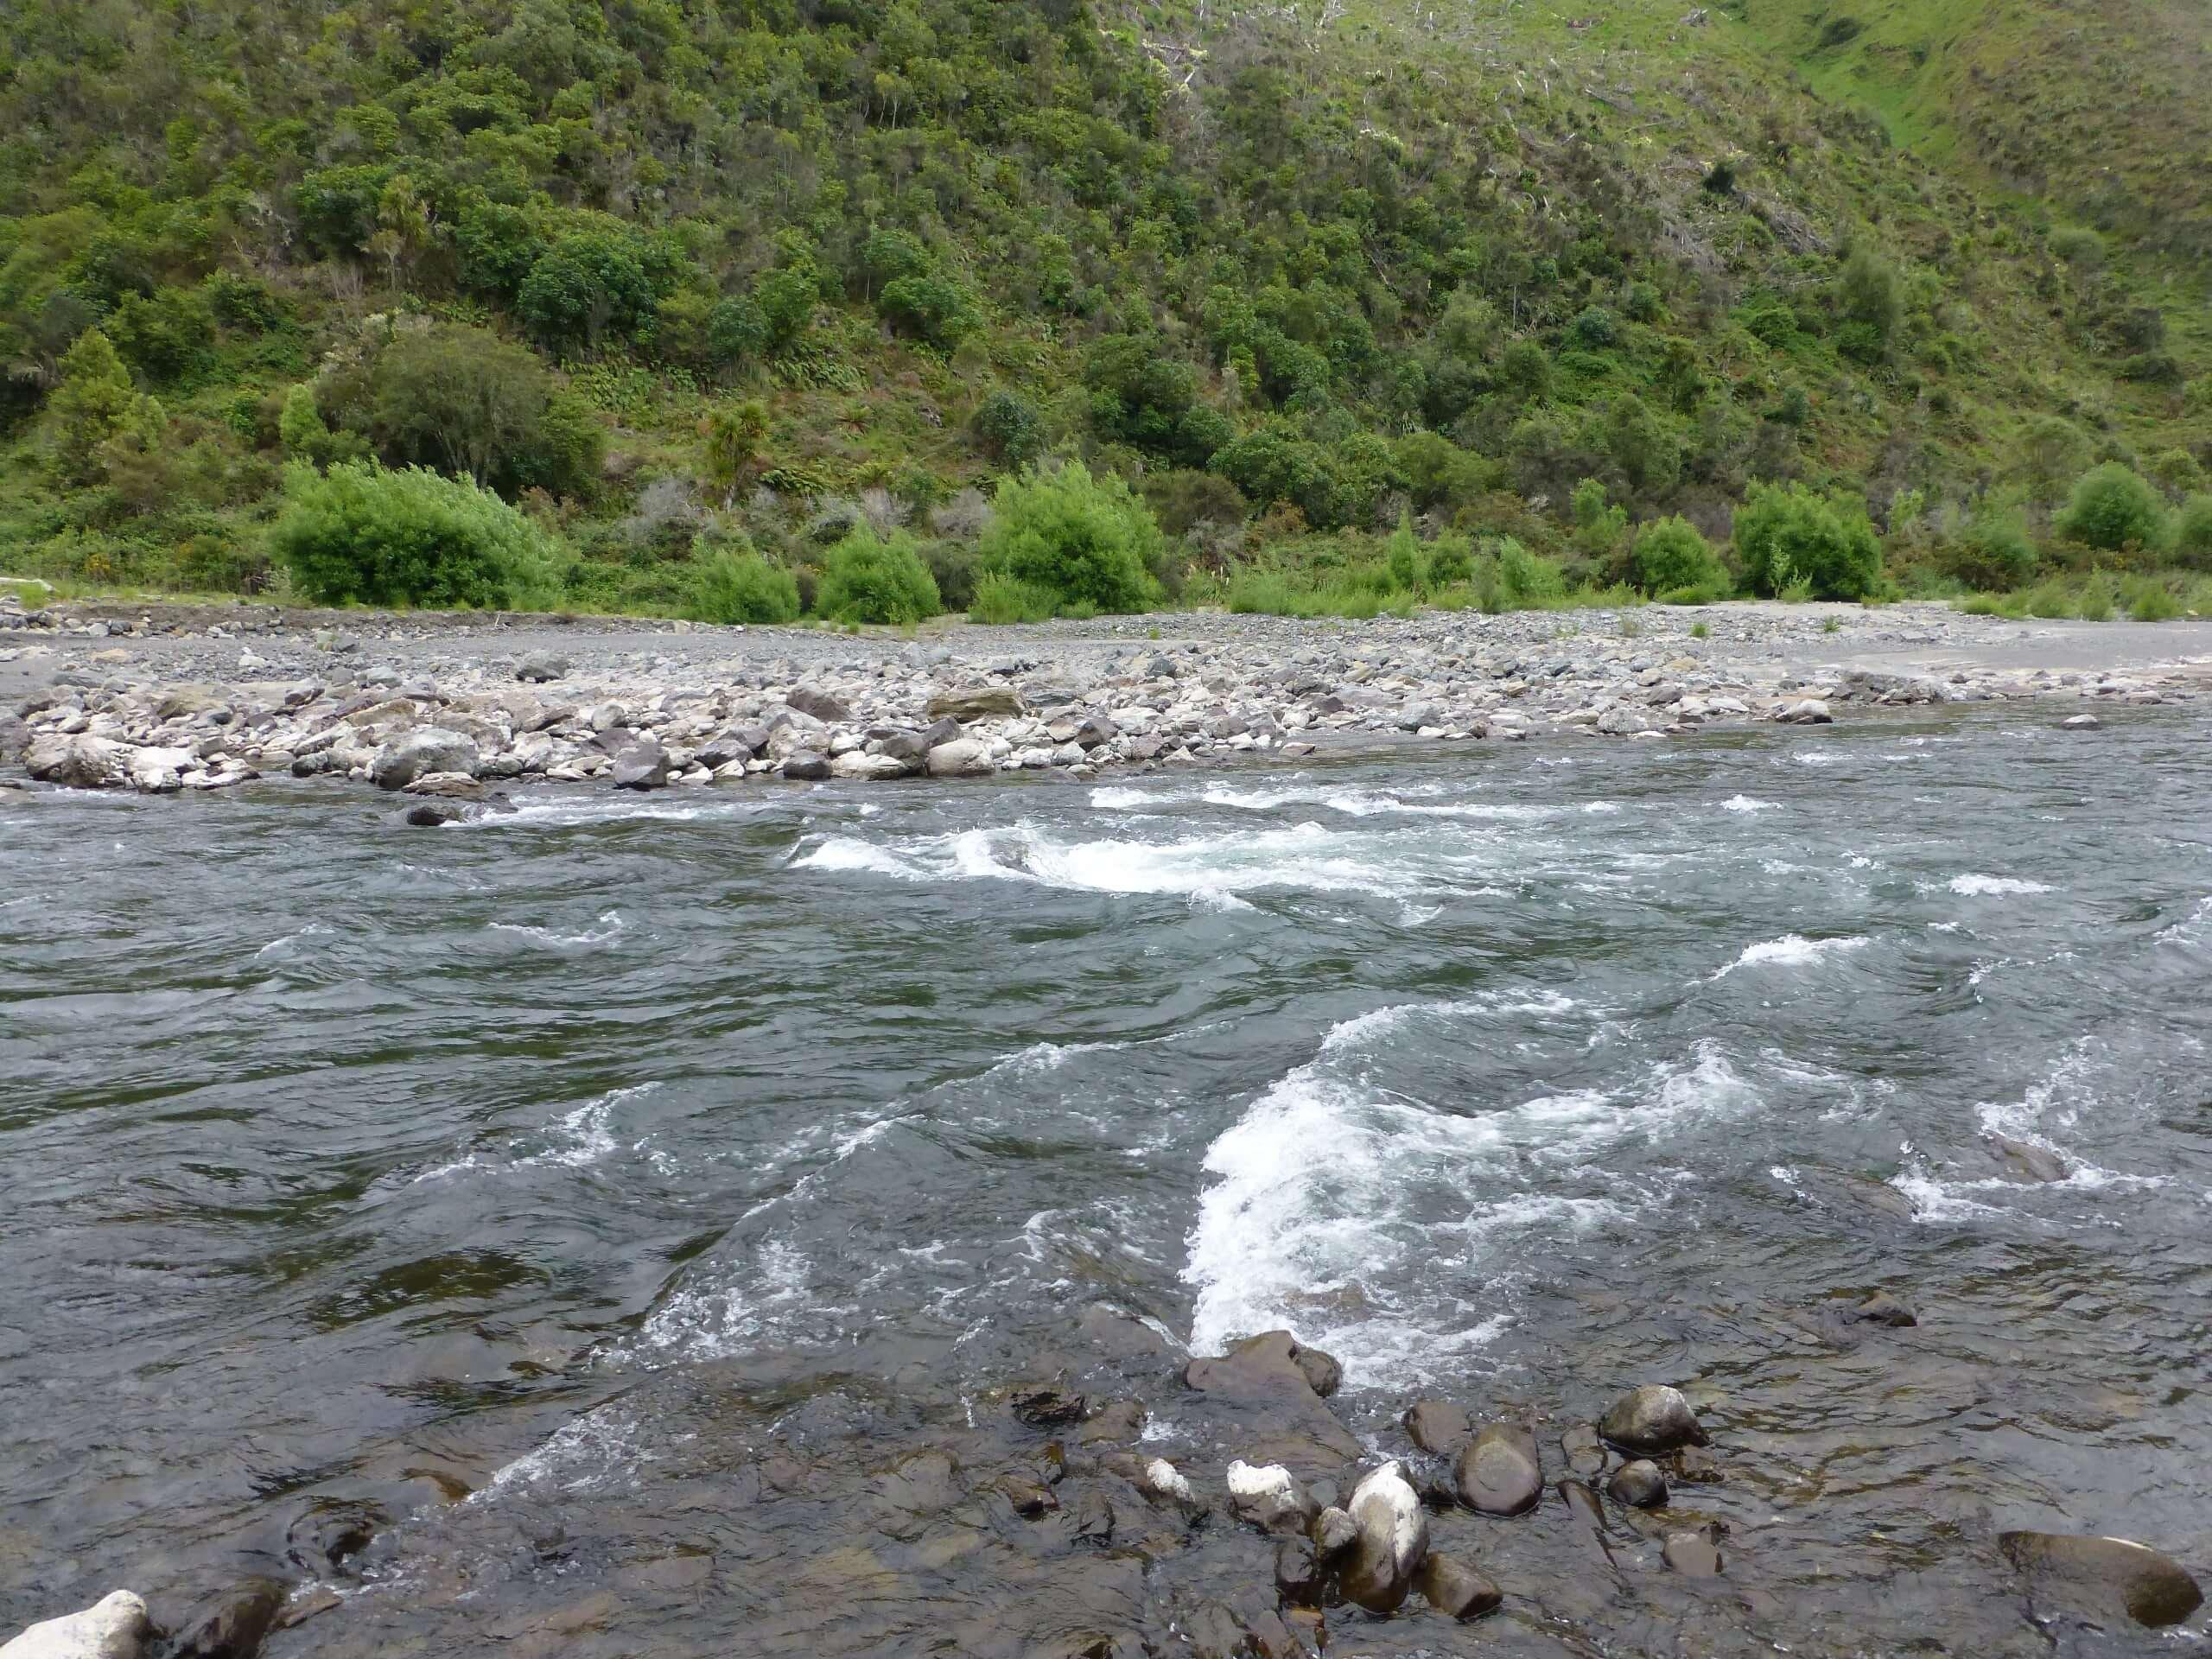 Weit weg Reisen, Mōhaka River, Mountain Valley Adventures Lodge 2